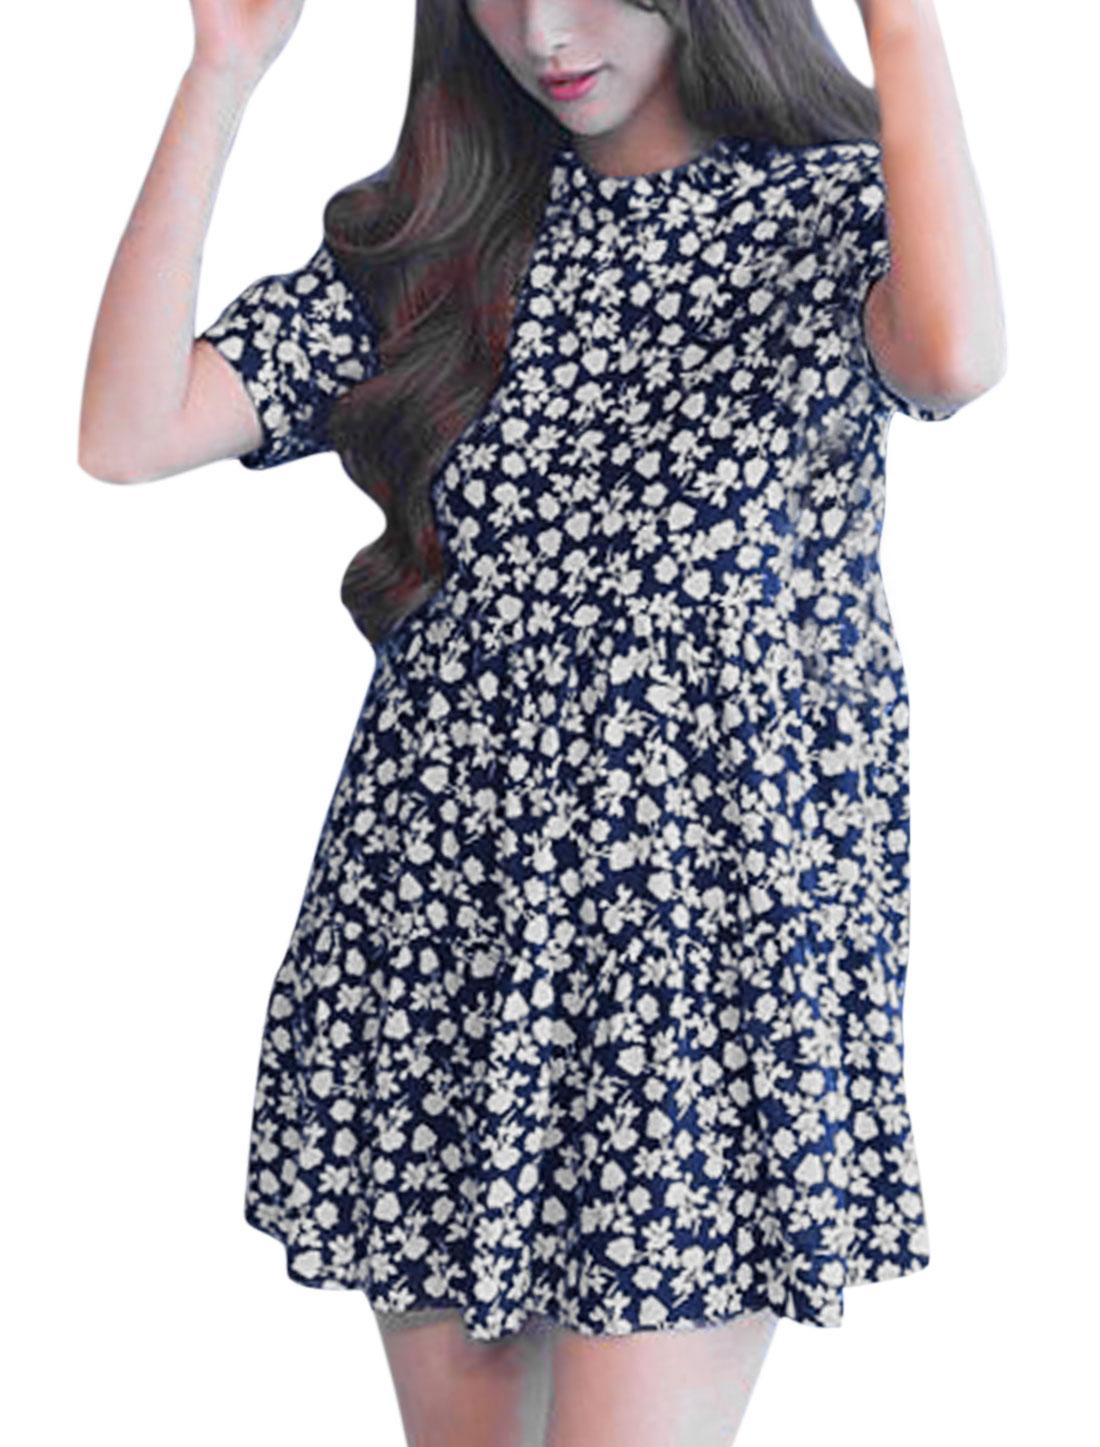 Woman Floral Prints Ruffled Collar Unlined Chiffon Dress Navy Blue XS